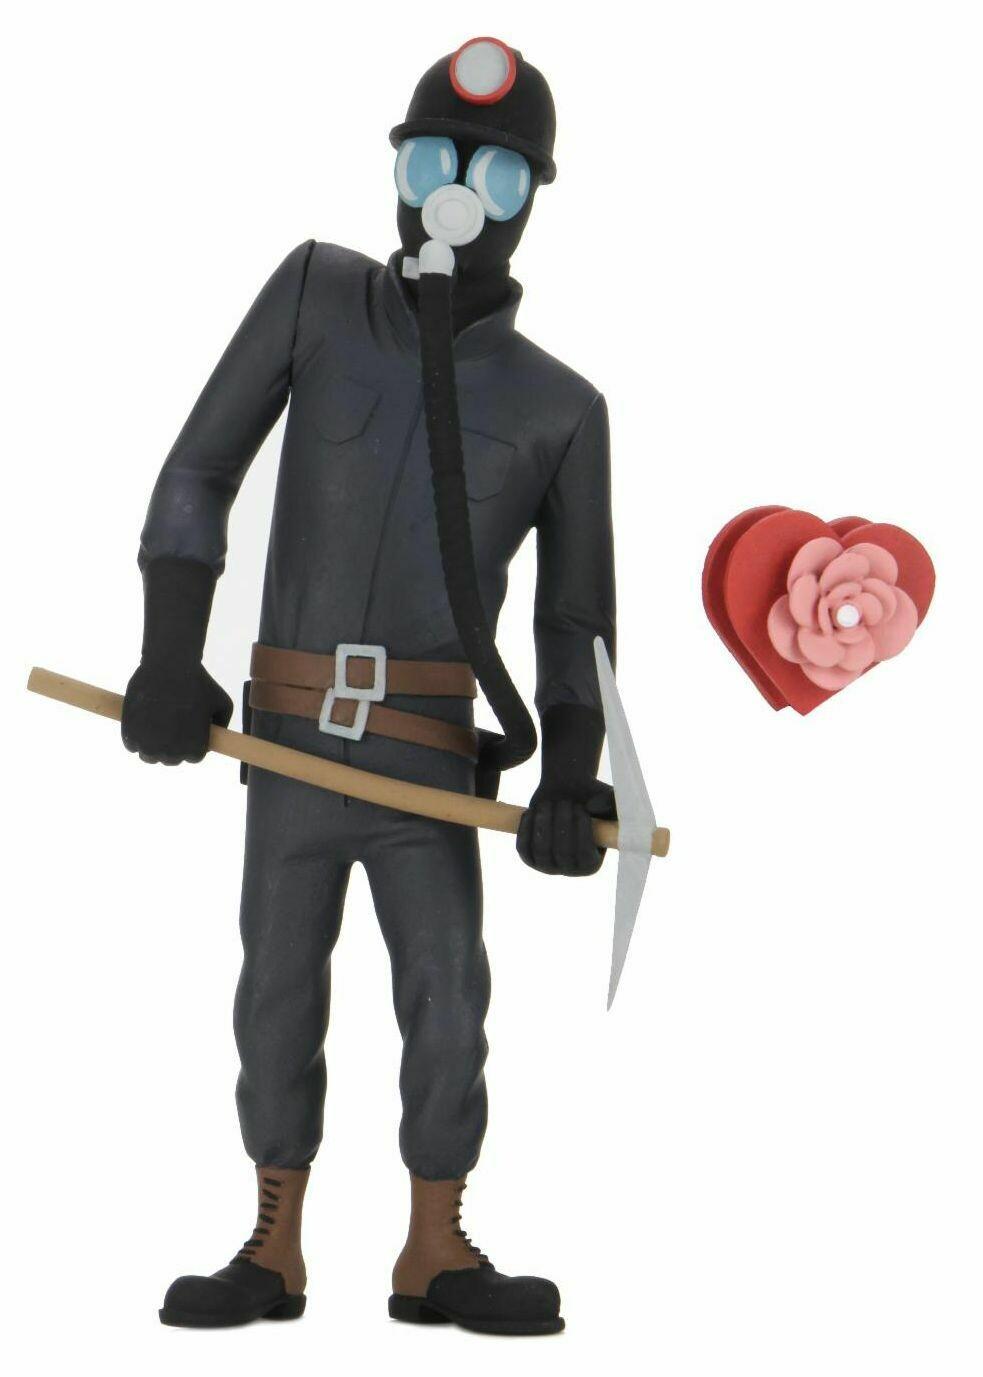 PRE-ORDER Neca My Bloody Valentine Toony Terrors The Miner